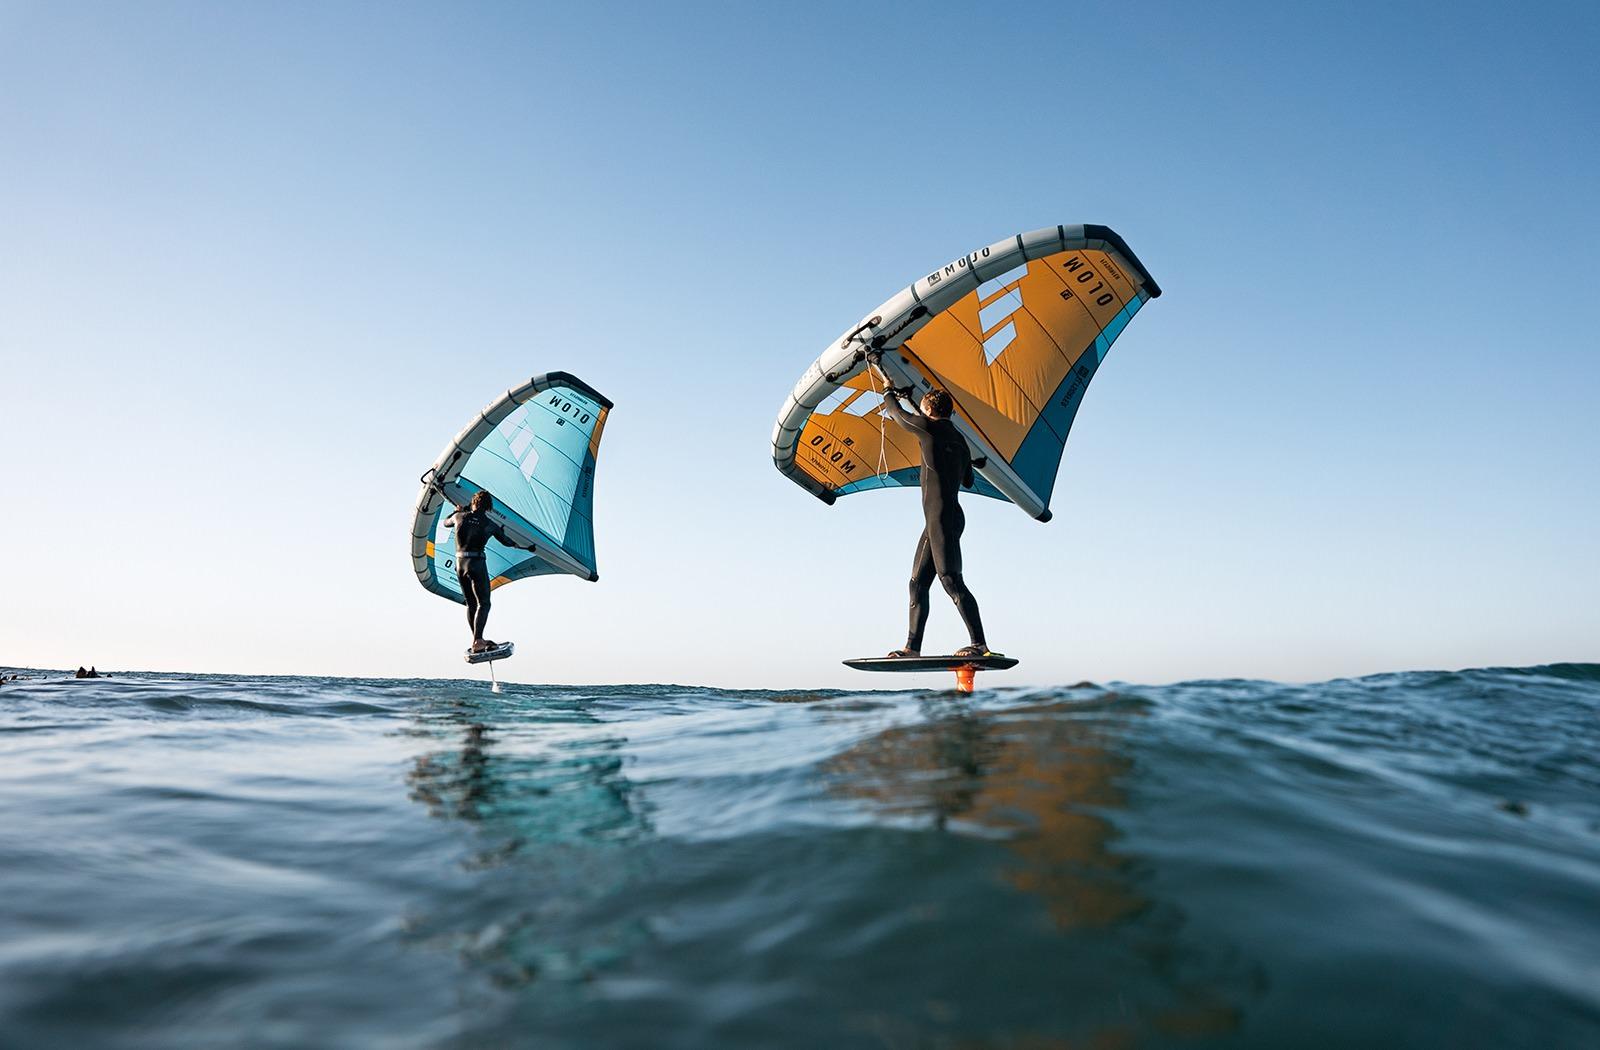 Flysurfer-MOJO-18-by-MiriamJoanna